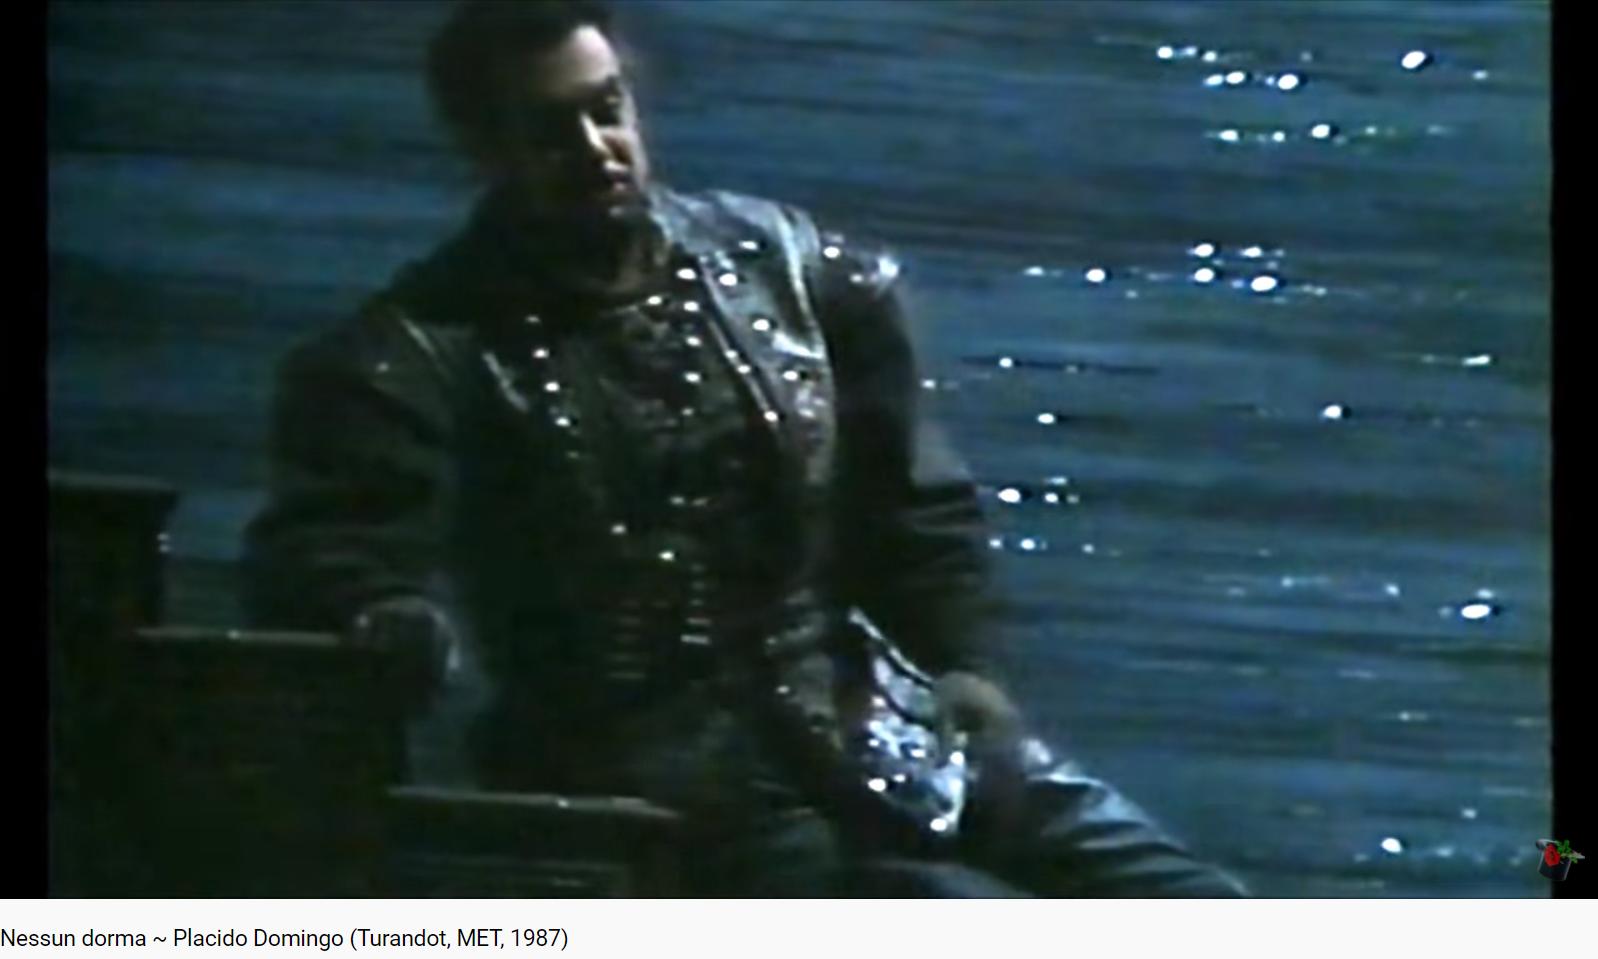 Puccini Turandot Nessun dorma (MET 1987)